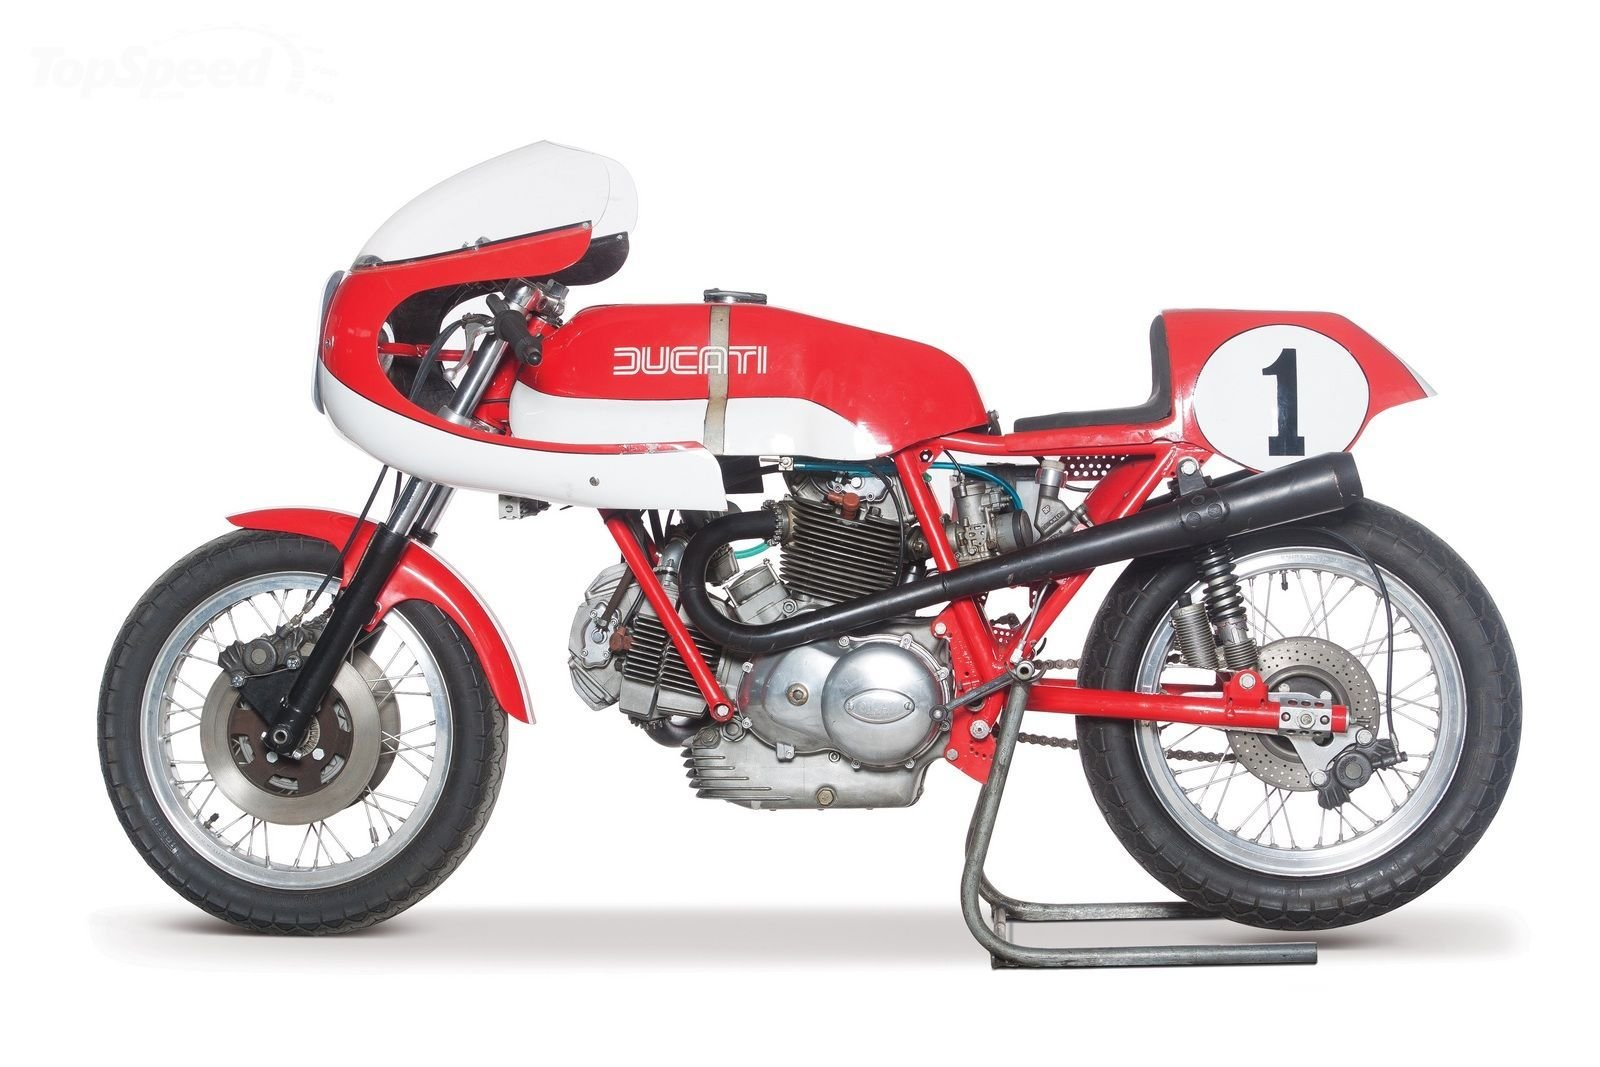 1974 Ducati 750 SS Corsa Motorcycle Retro Classic Race ...